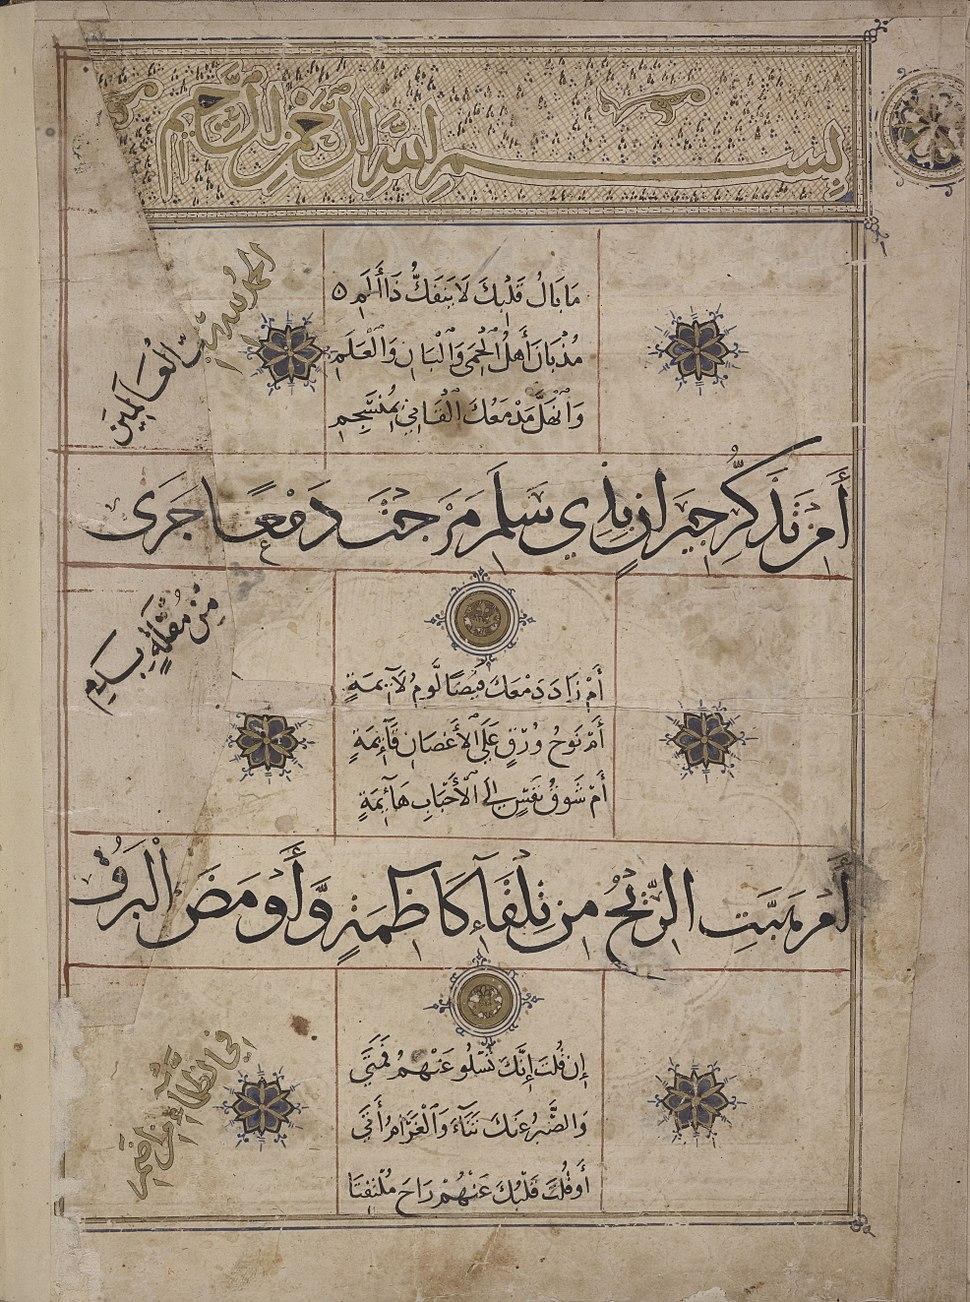 Al-Kawakib-al-durriyah-Page-0006